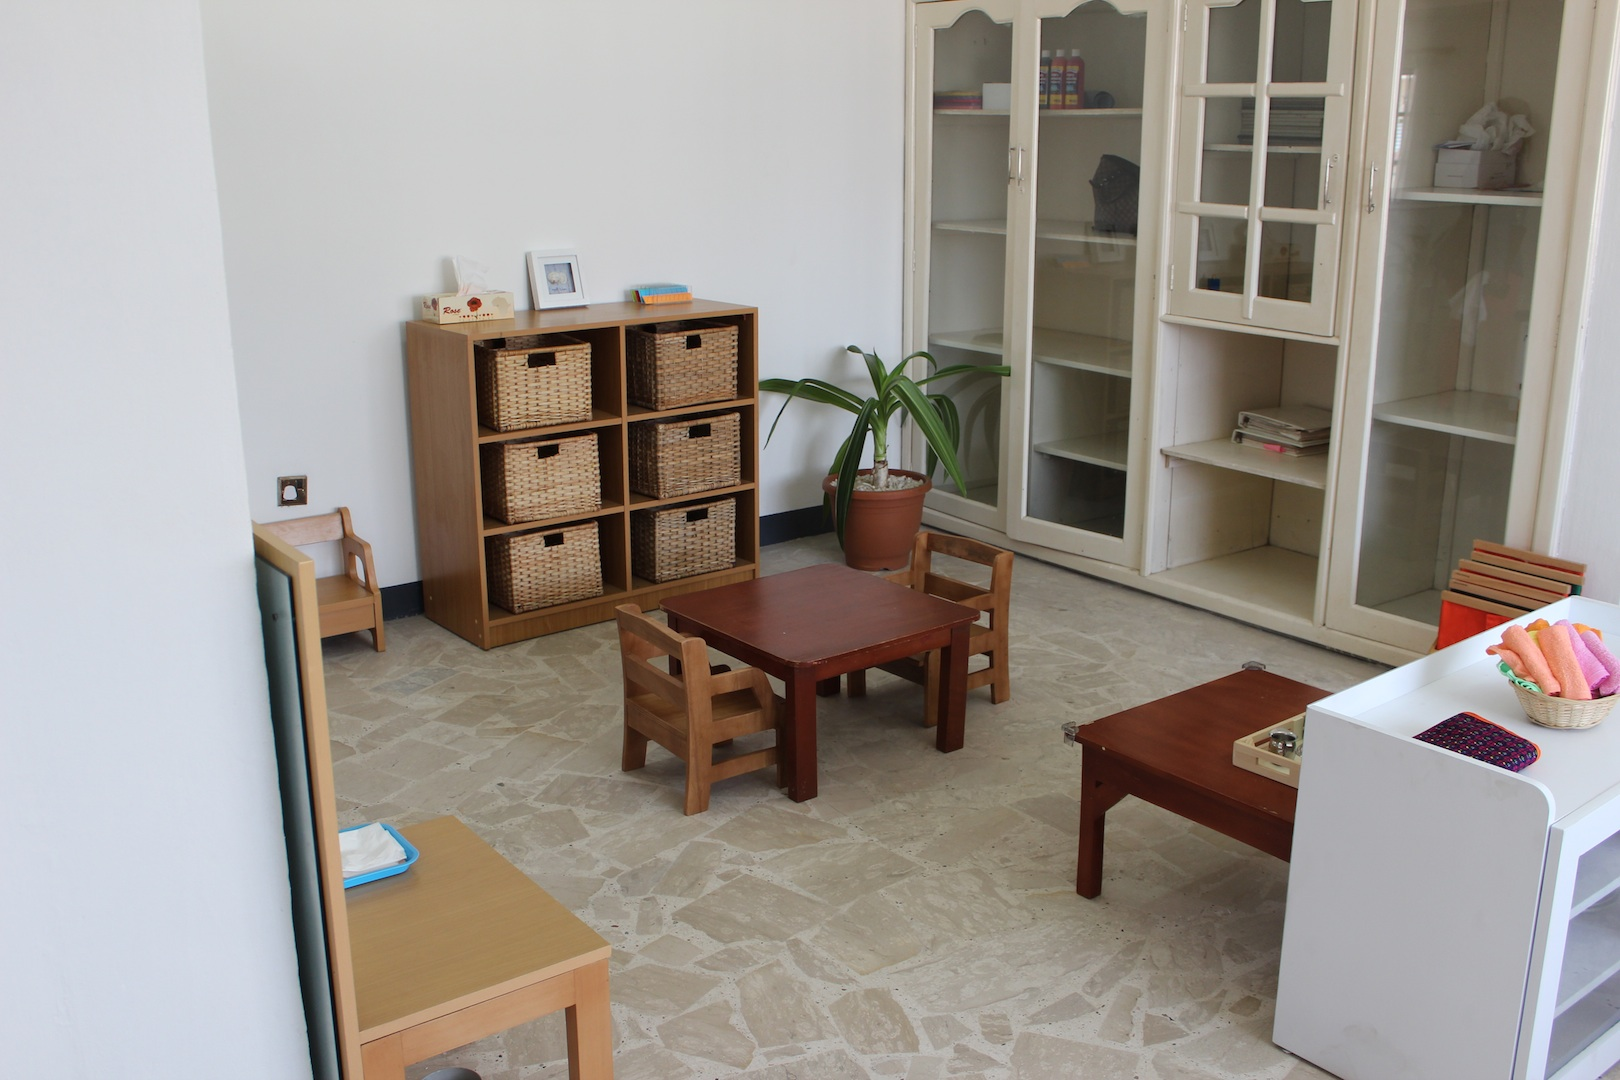 Choosing A Montessori School The Prepared Environment